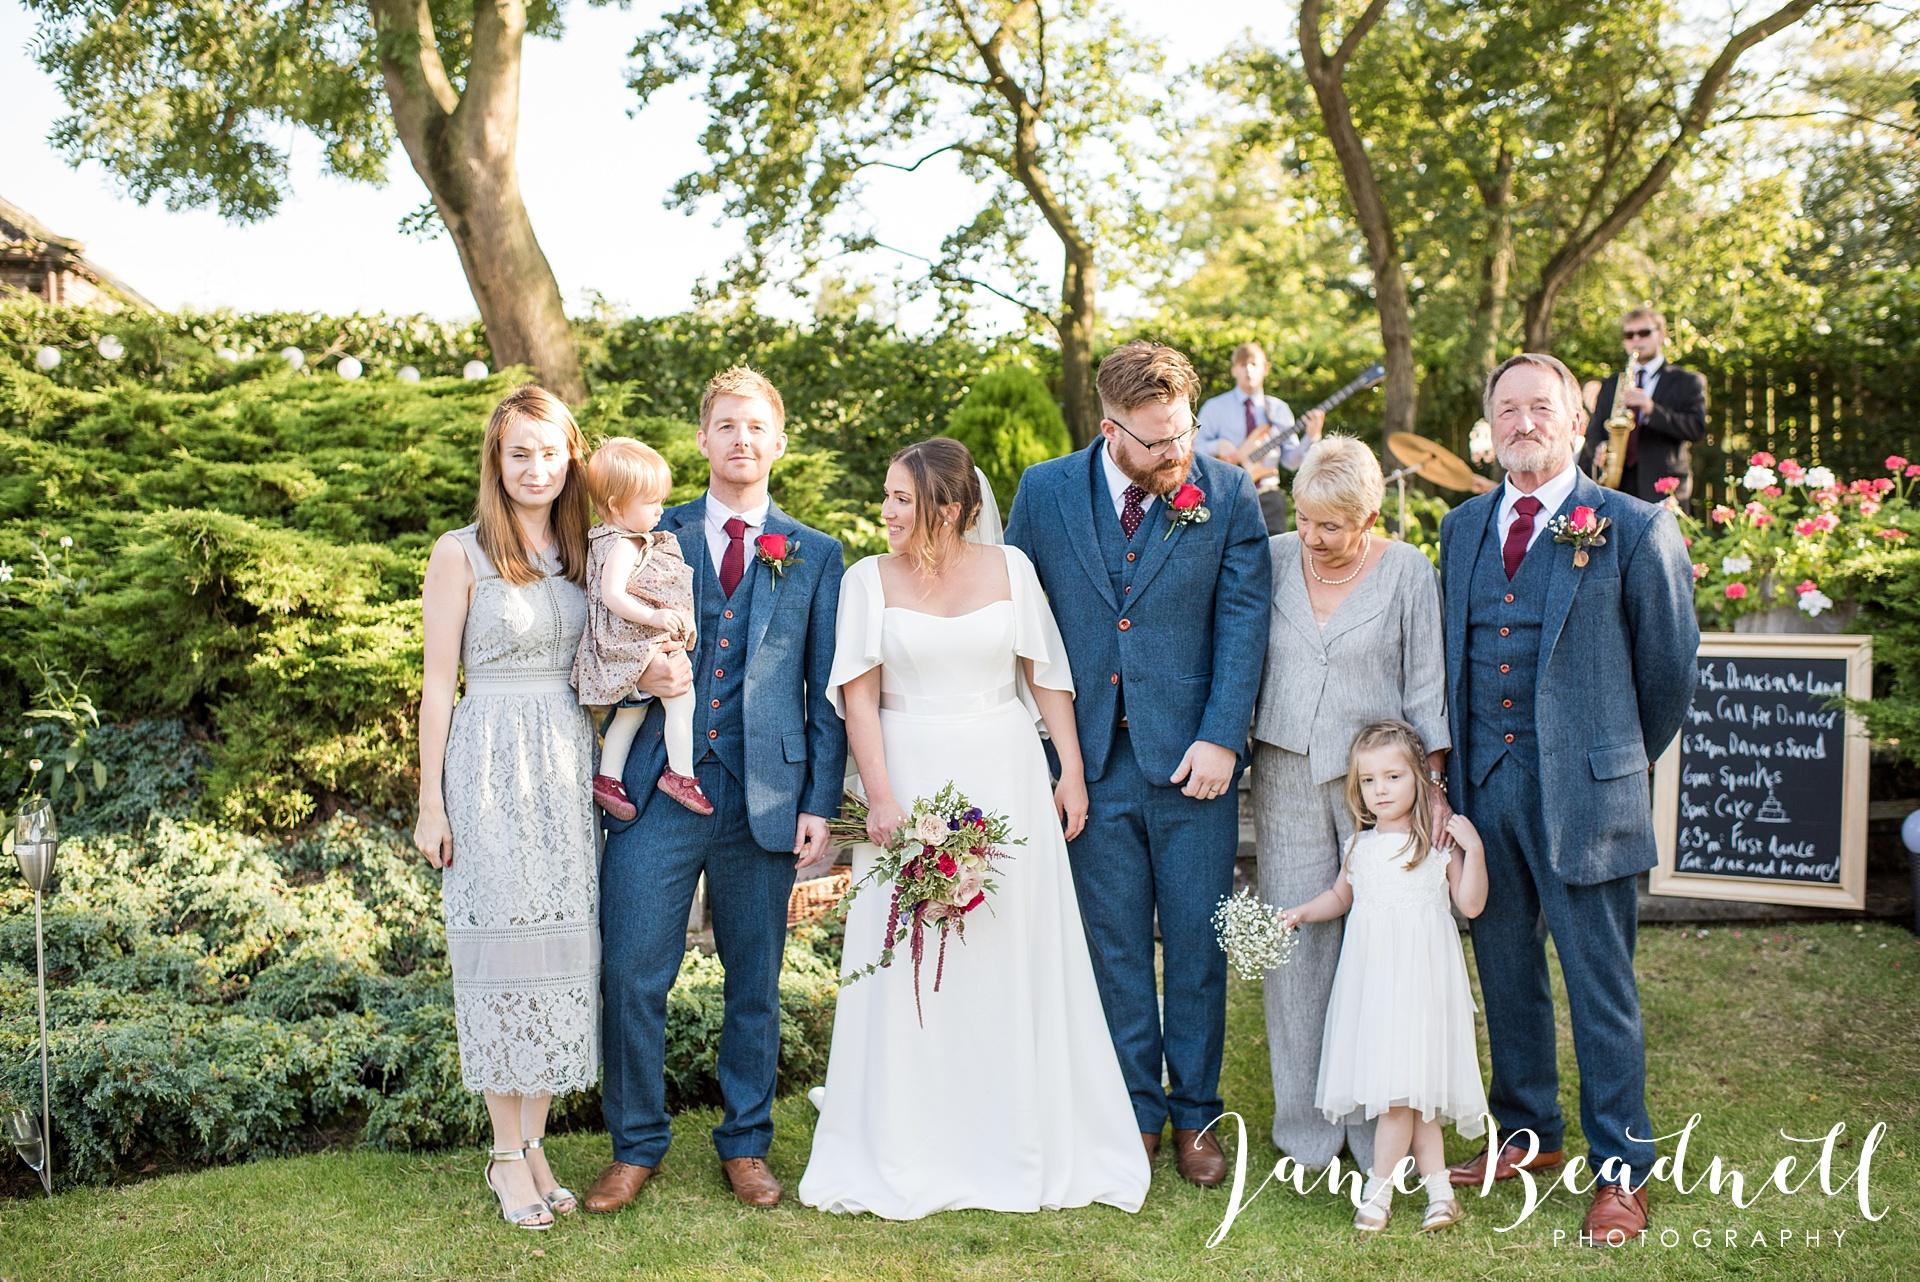 fine-art-wedding-photographer-jane-beadnell-yorkshire-wedding-photographer_0106